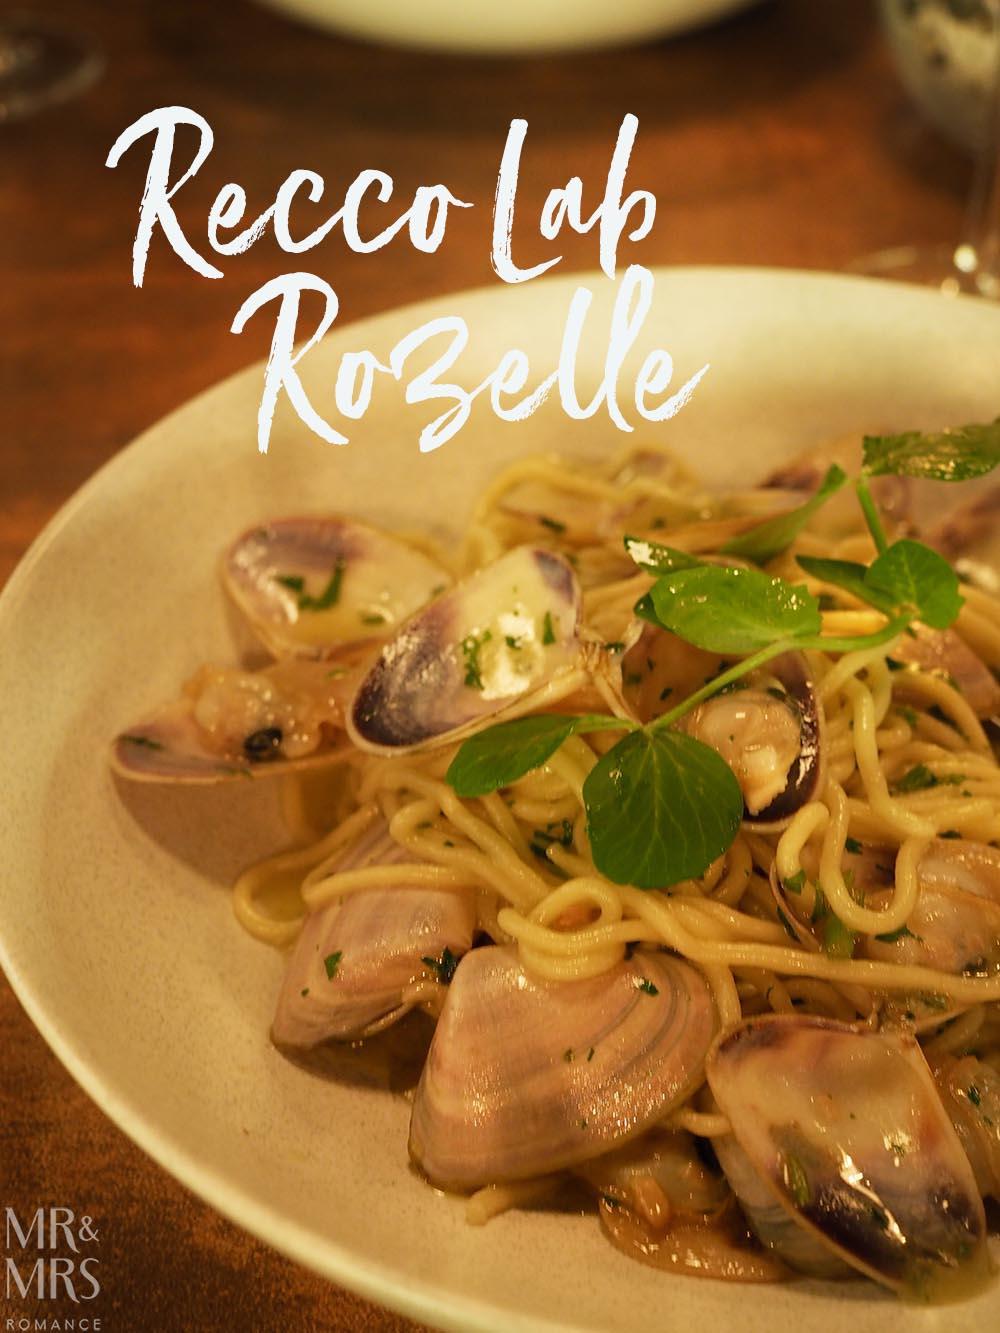 ReccoLab Rozelle - Sydney restaurant review